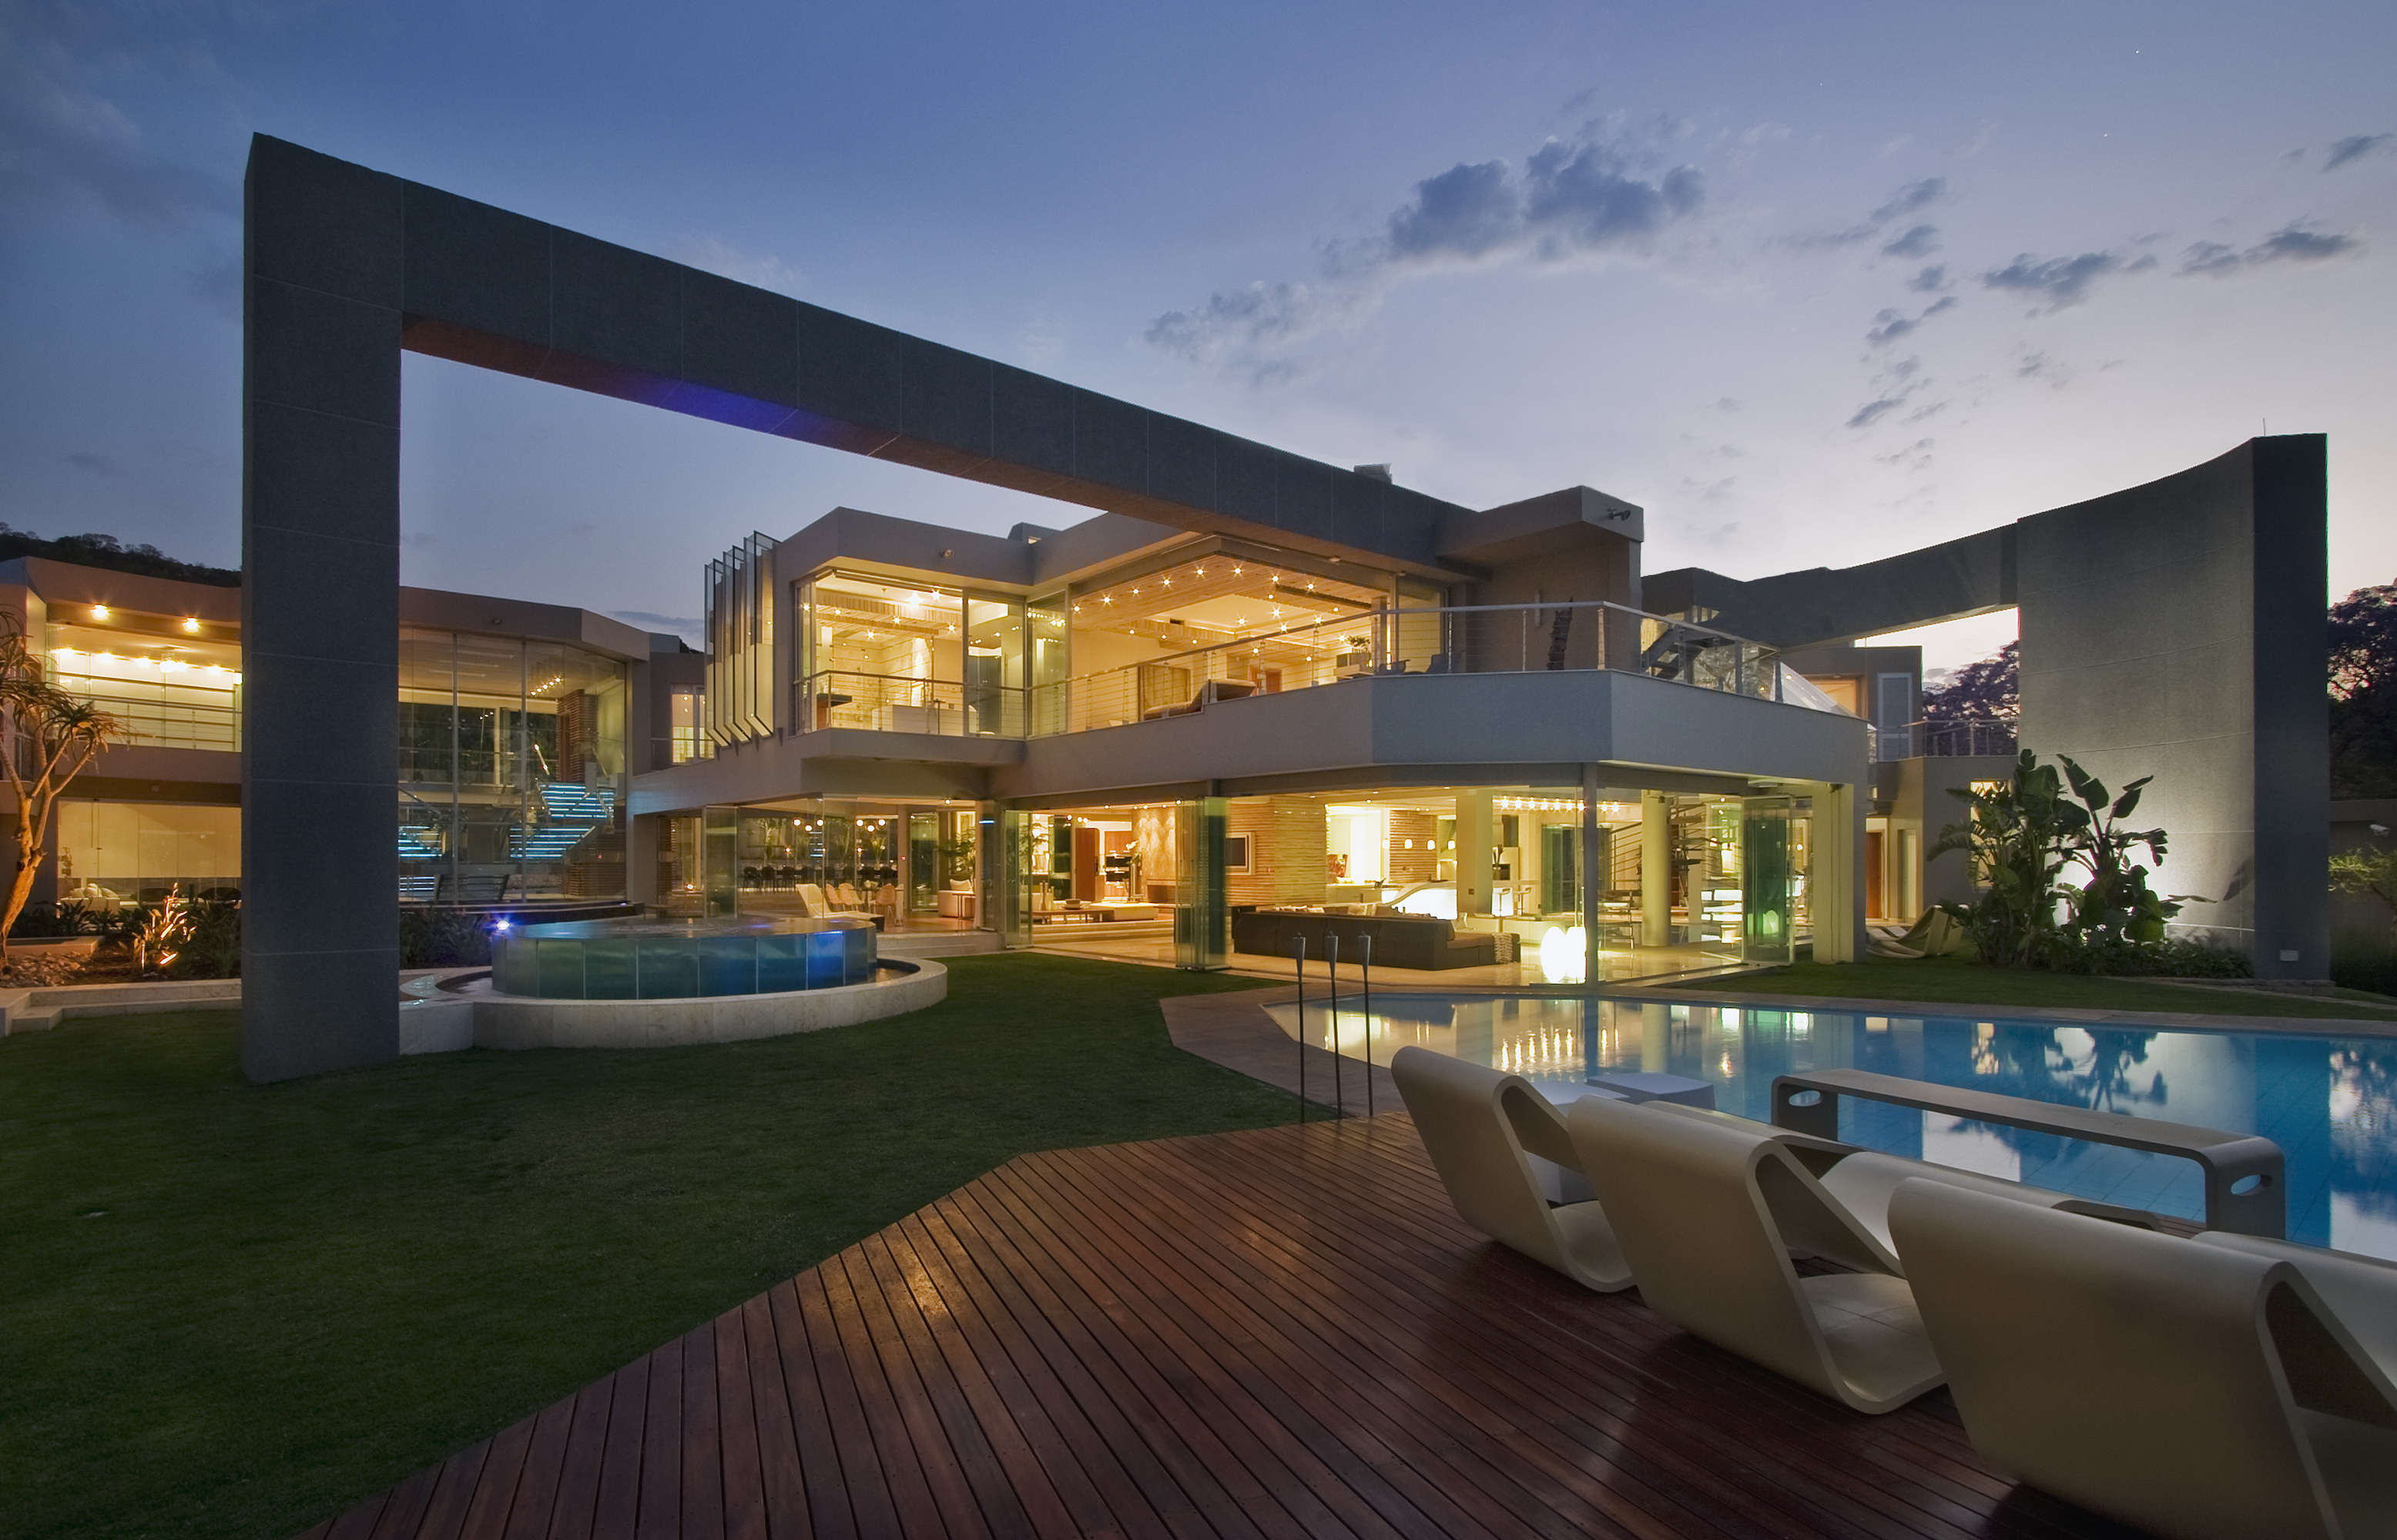 Glass house architect magazine nico van der meulen architects johannesbrg south africa multifamily new construction custom design